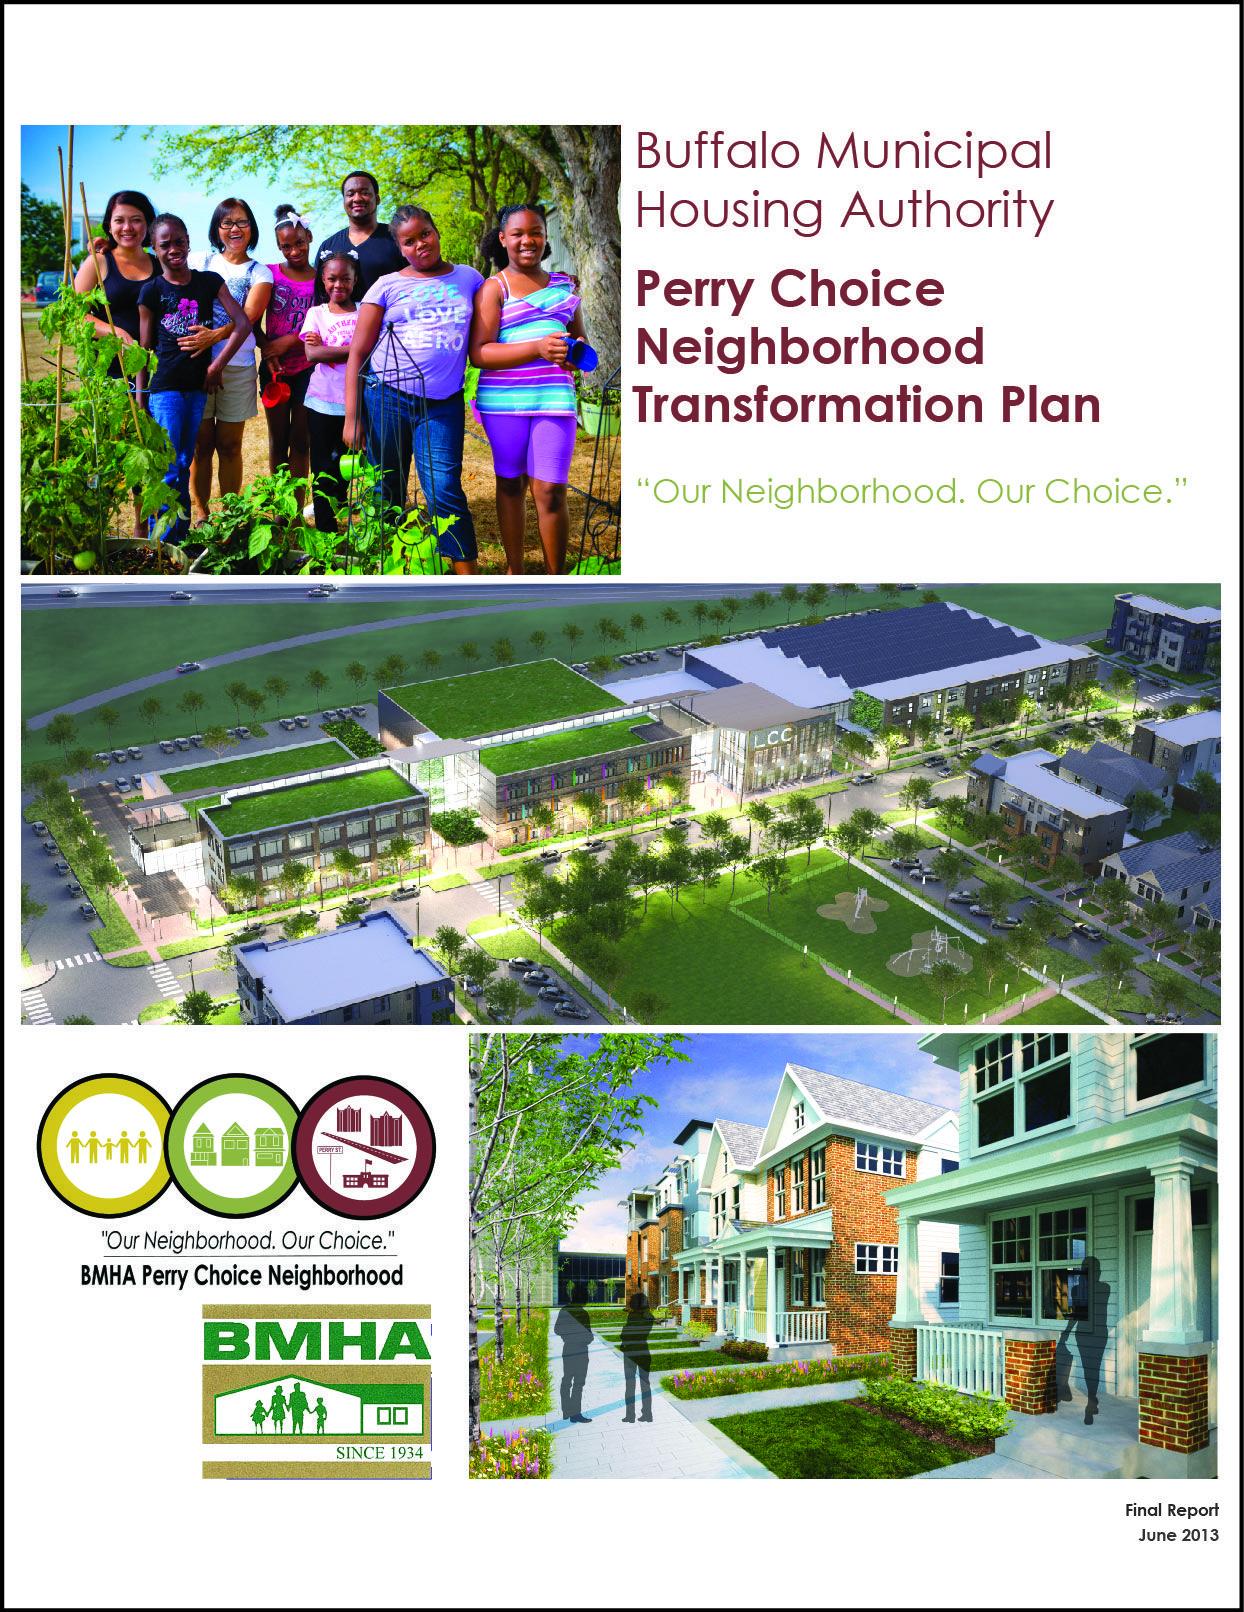 The Buffalo Municipal Housing Authority (BMHA) Perry Choice